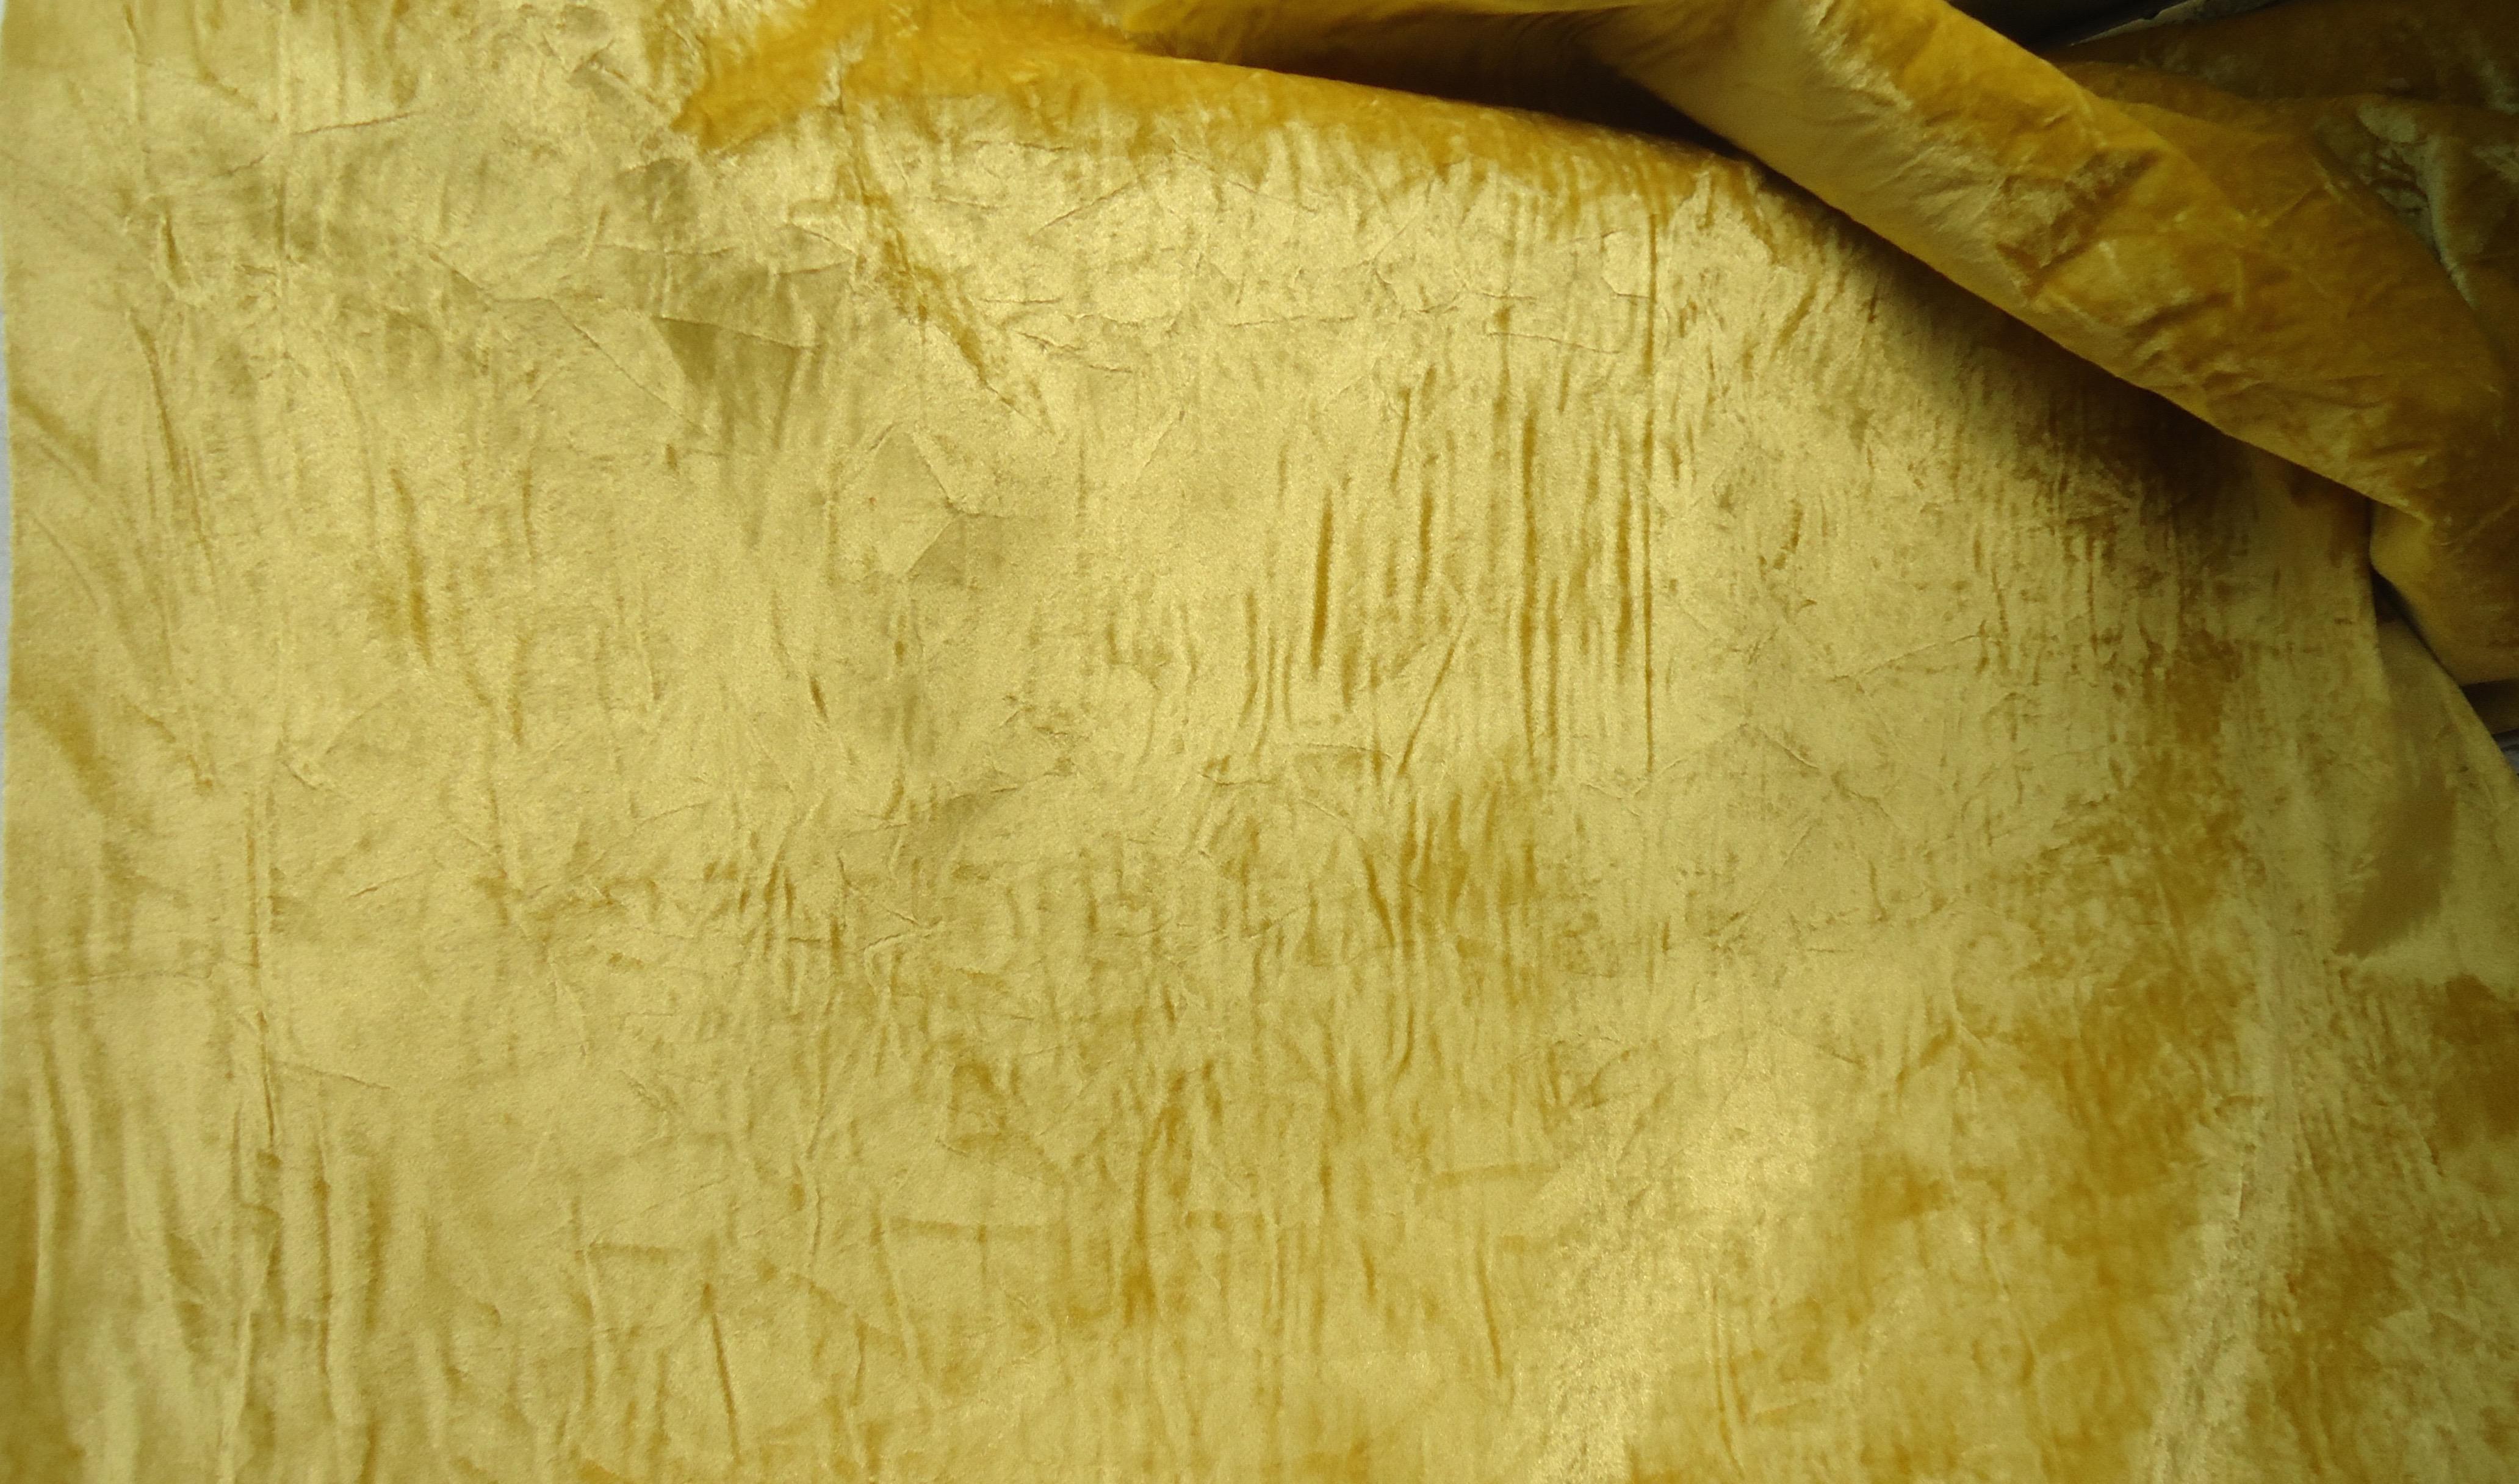 Vintage Crushed Gold Velvet Upholstery Fabric 1 Yard Chairish